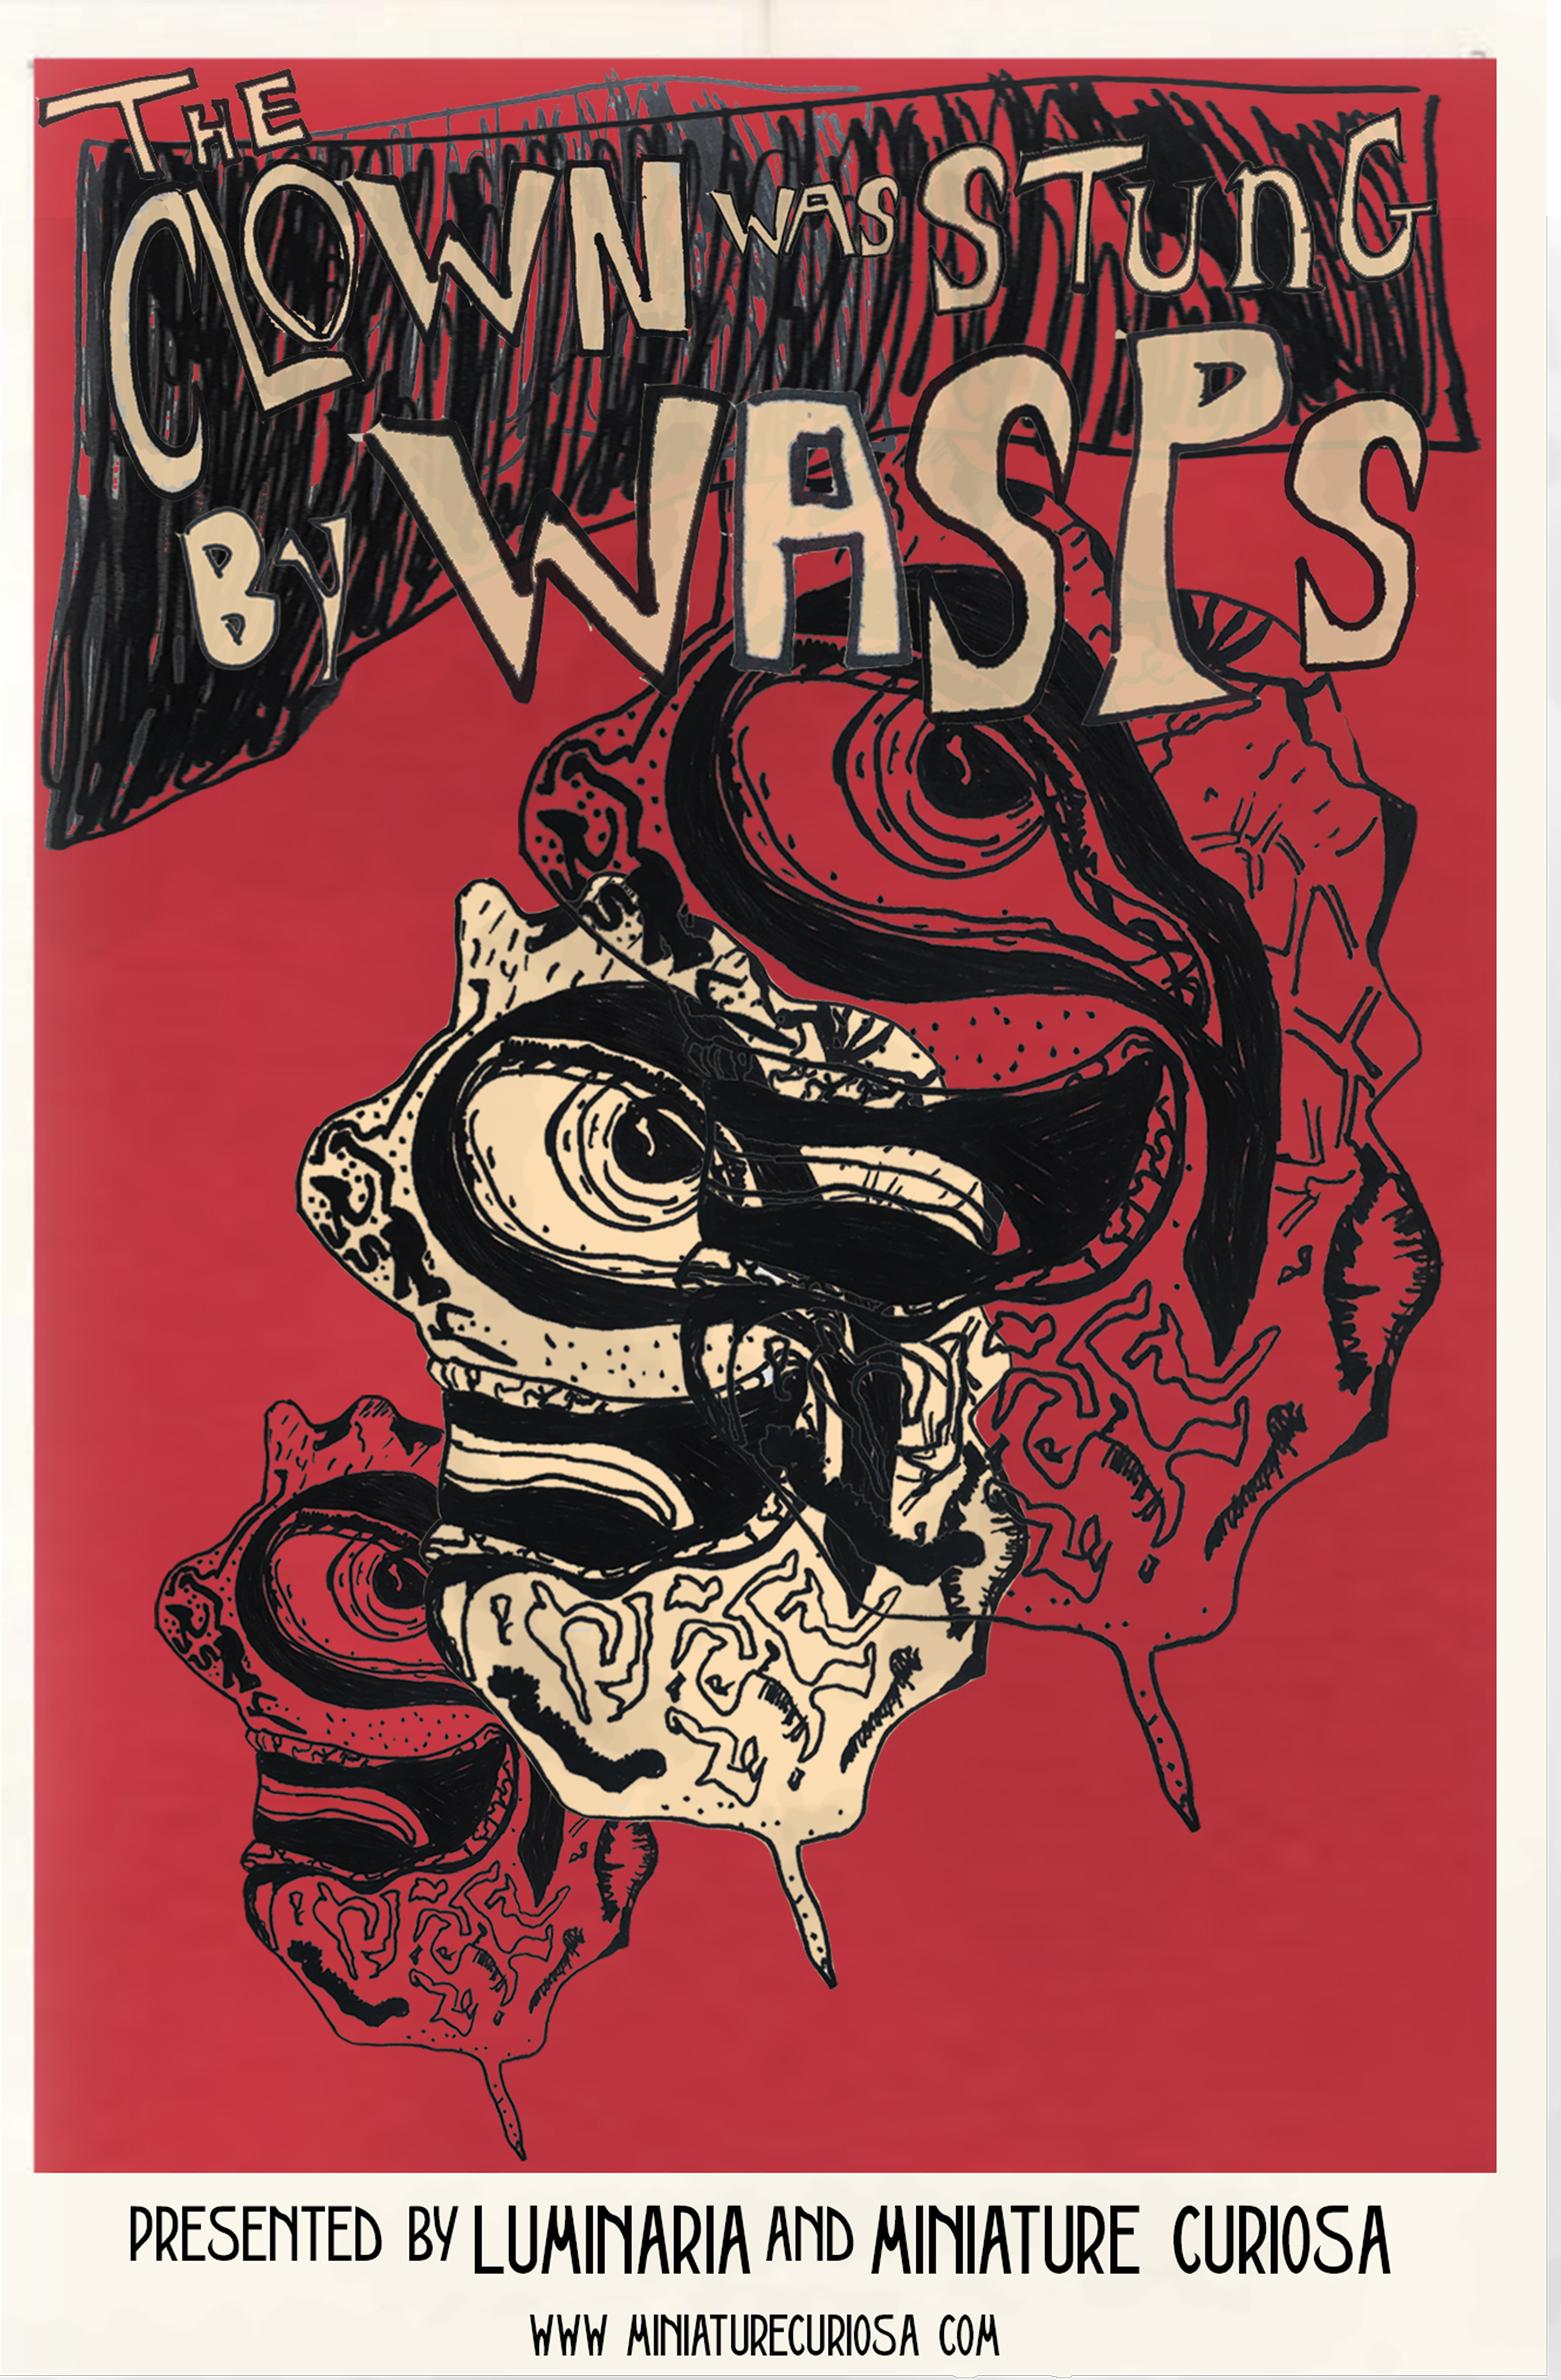 clown_wasps_stung_poster.jpg